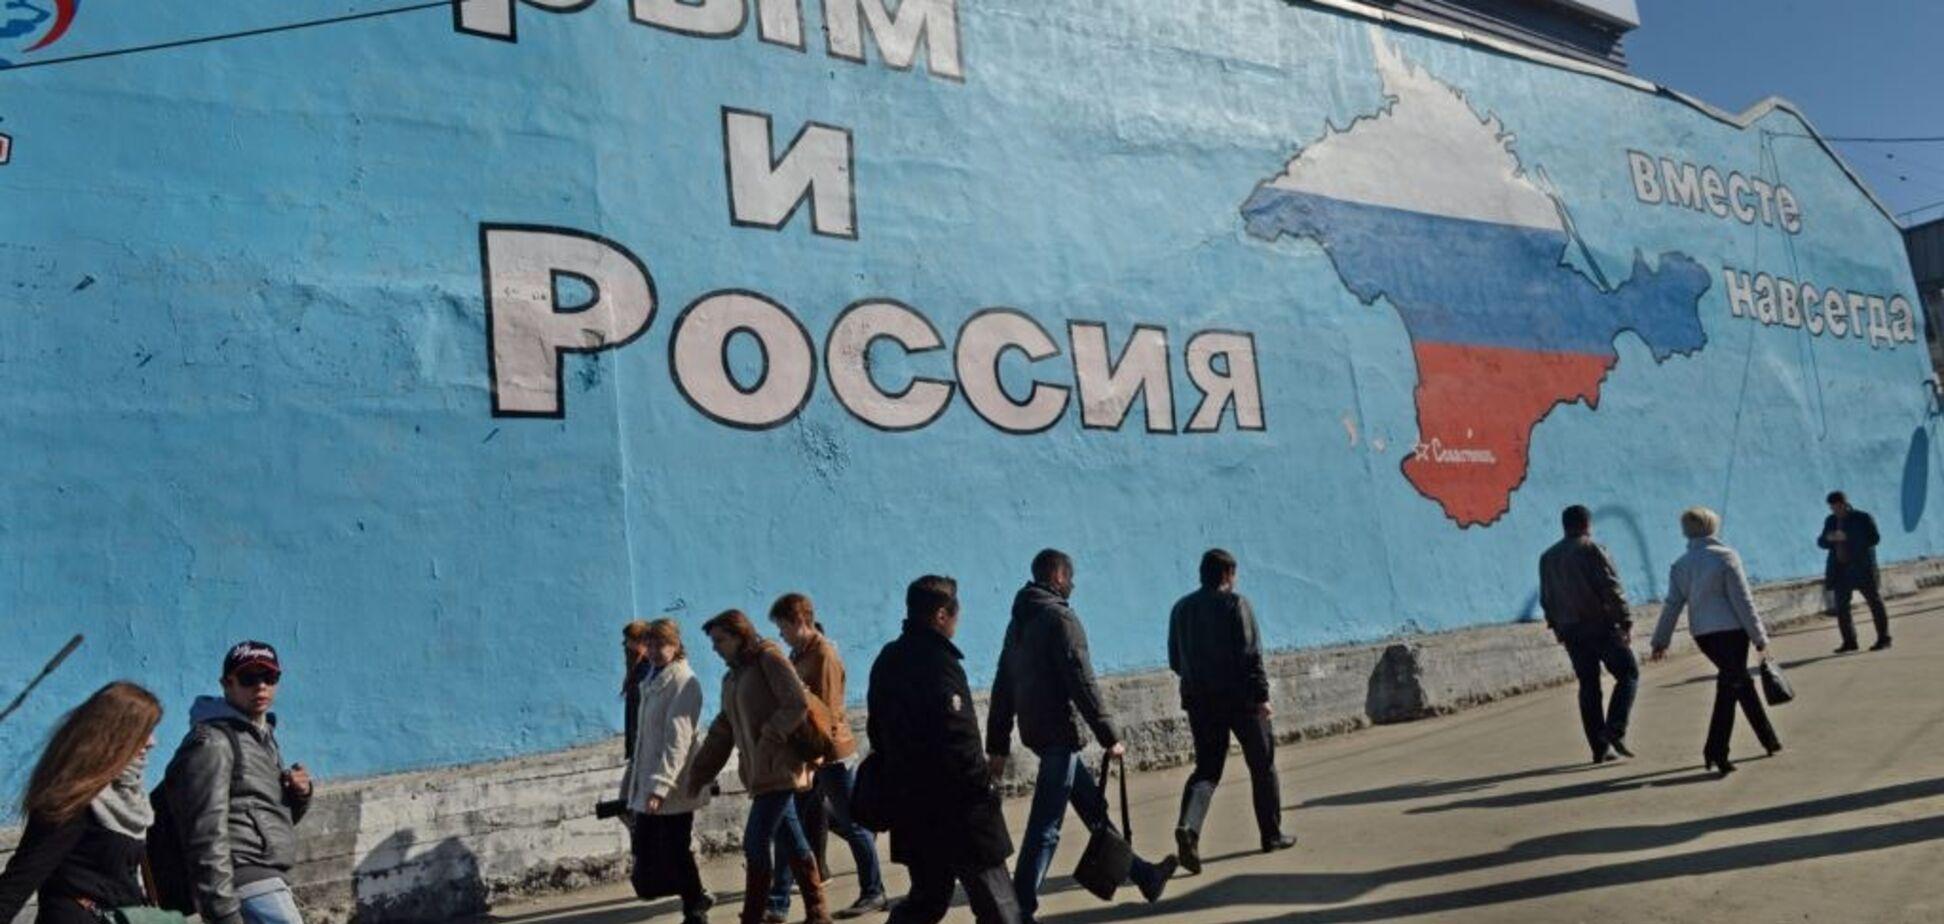 Важная победа Украины: озвучен прогноз, как Россию накажут за Крым